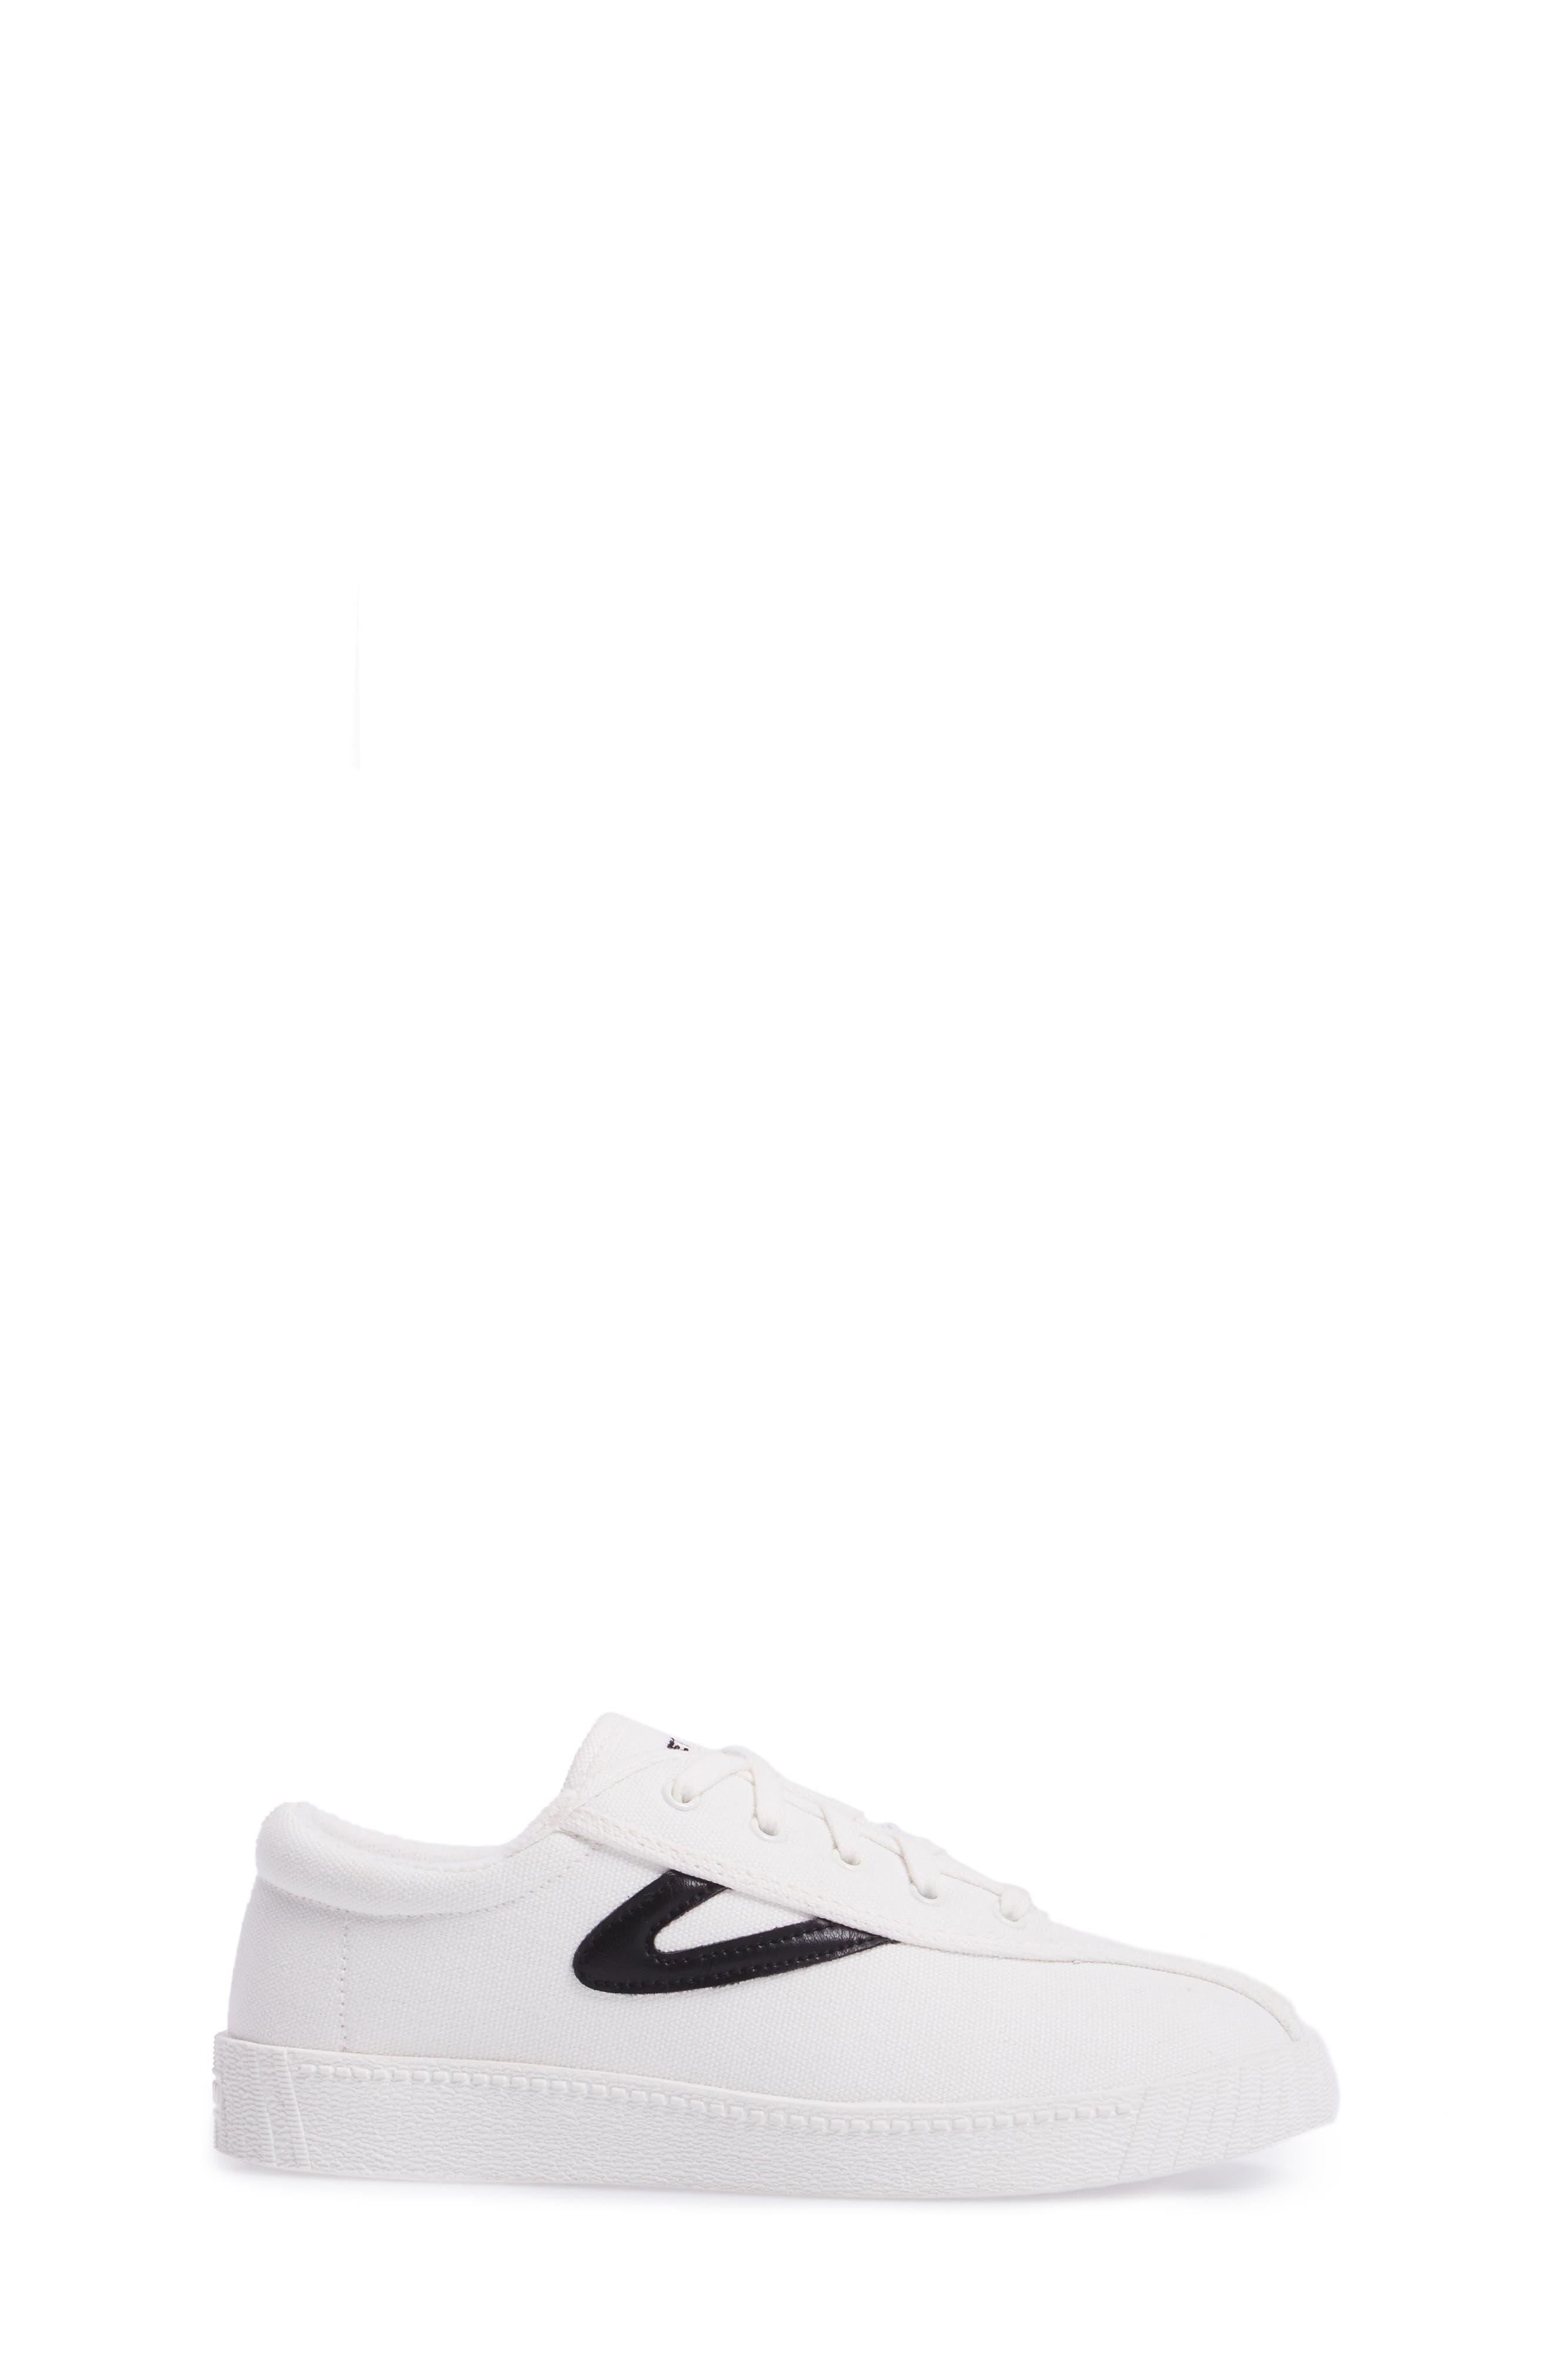 Nylite Plus Sneaker,                             Alternate thumbnail 8, color,